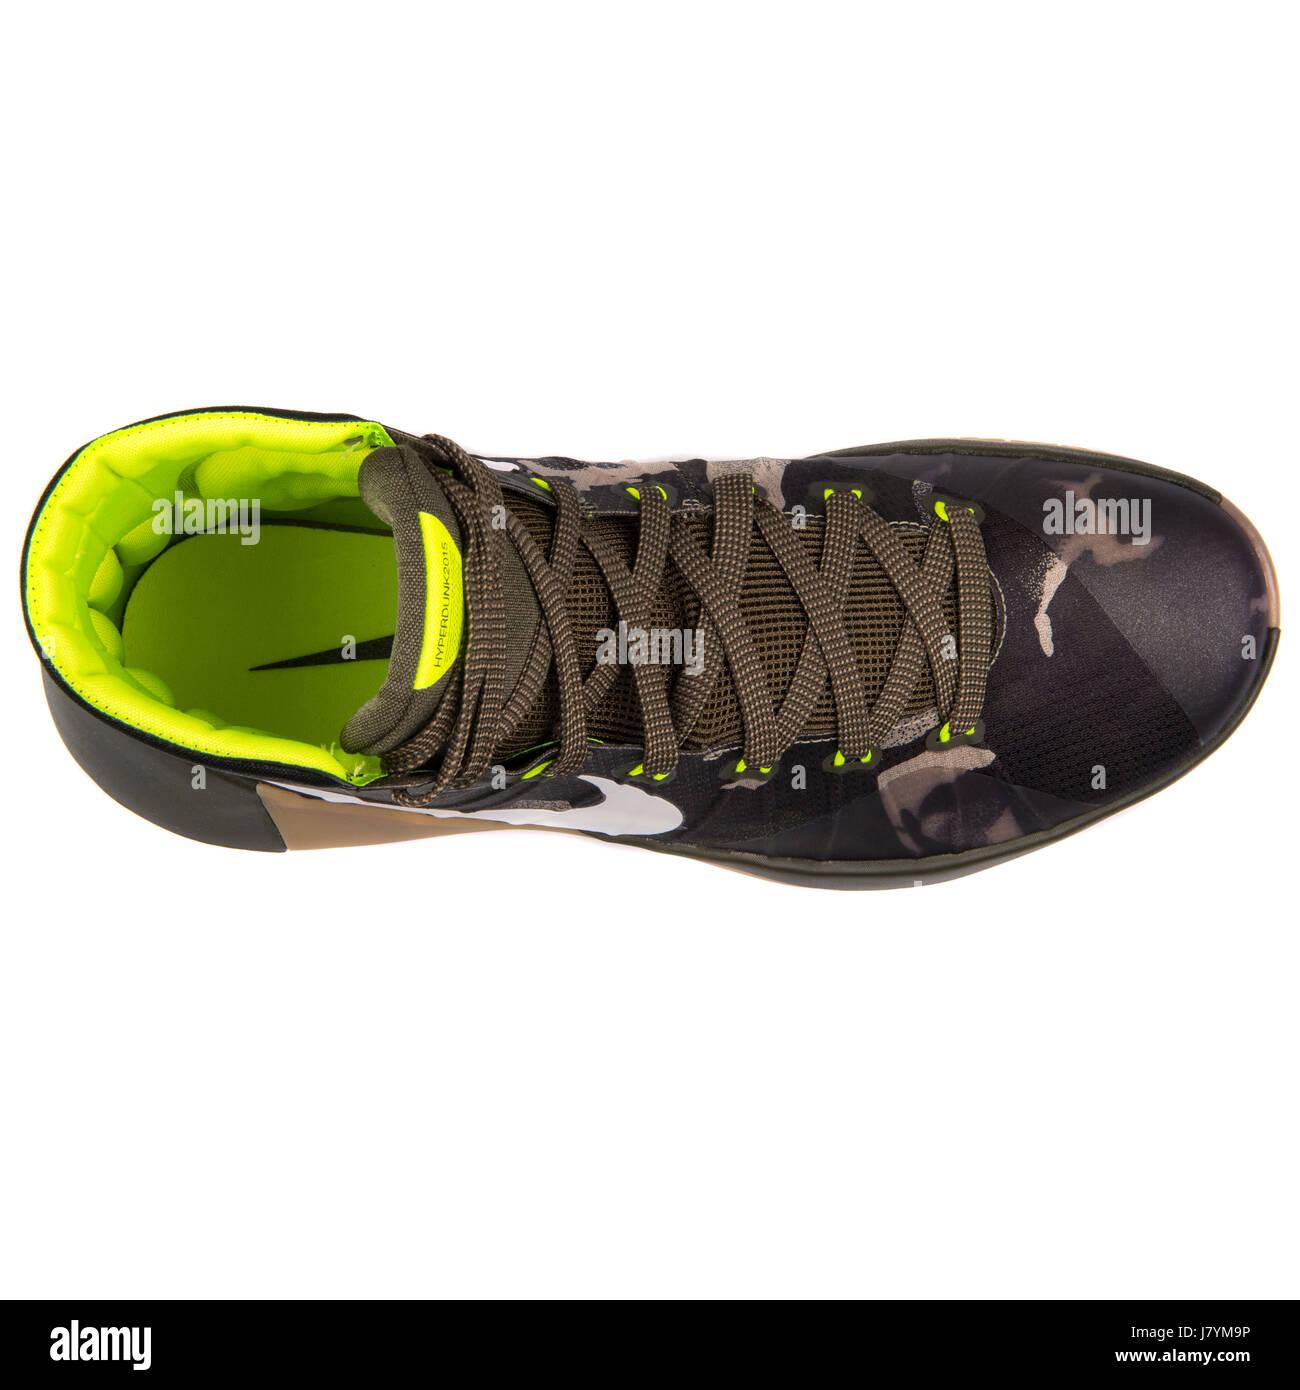 finest selection 013a7 3f20f Nike Hyperdunk 2015 PRM Men Dark Camo Khaki Basketball Sneakers - 749567-313  - Stock